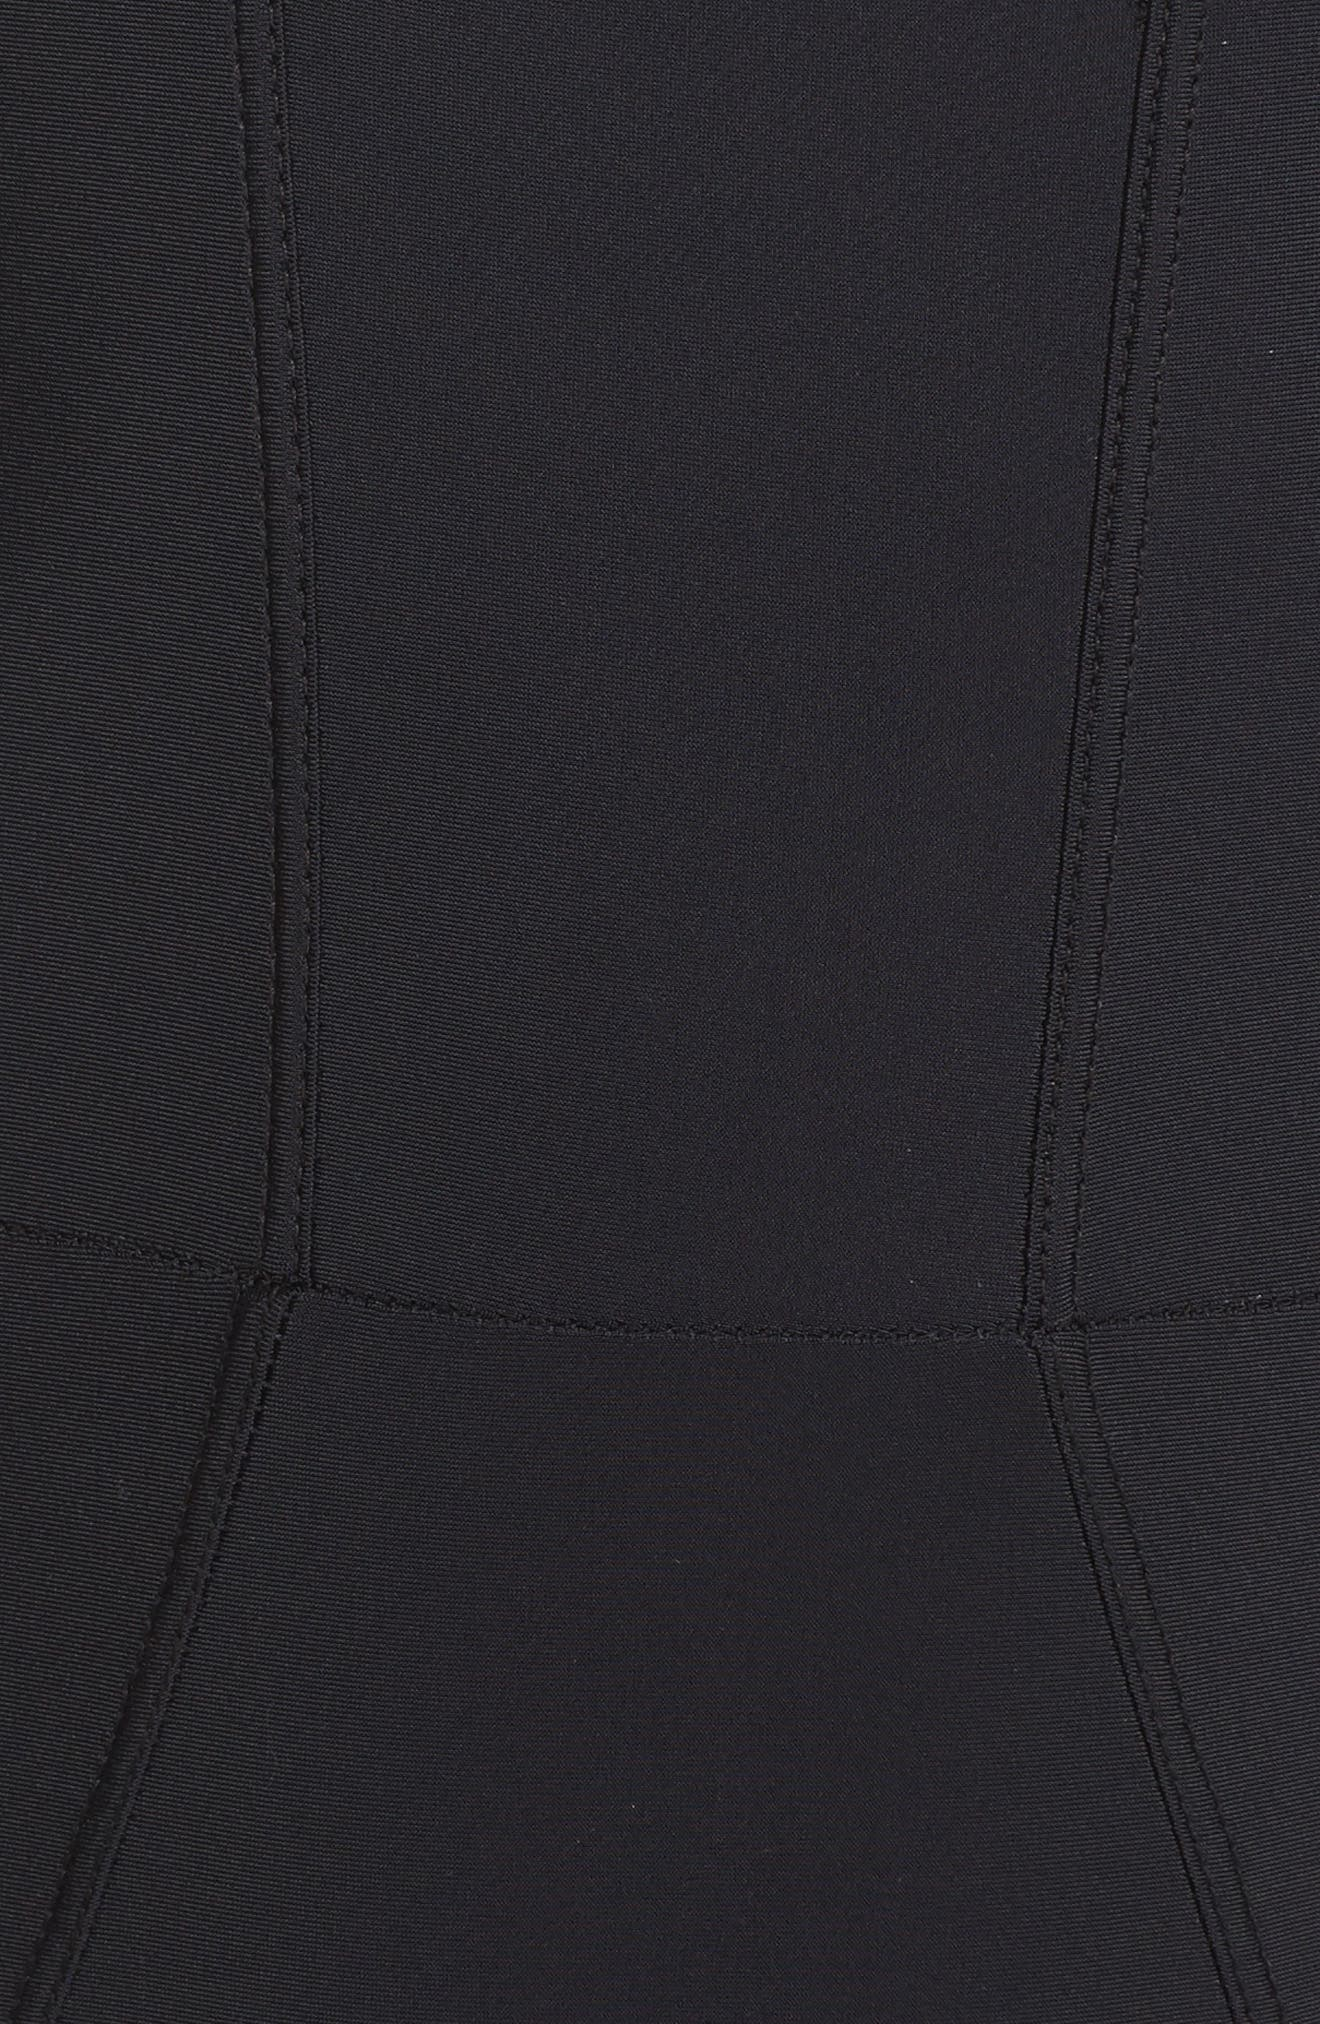 Tidal Back Zip One-Piece Swimsuit,                             Alternate thumbnail 5, color,                             BLACK